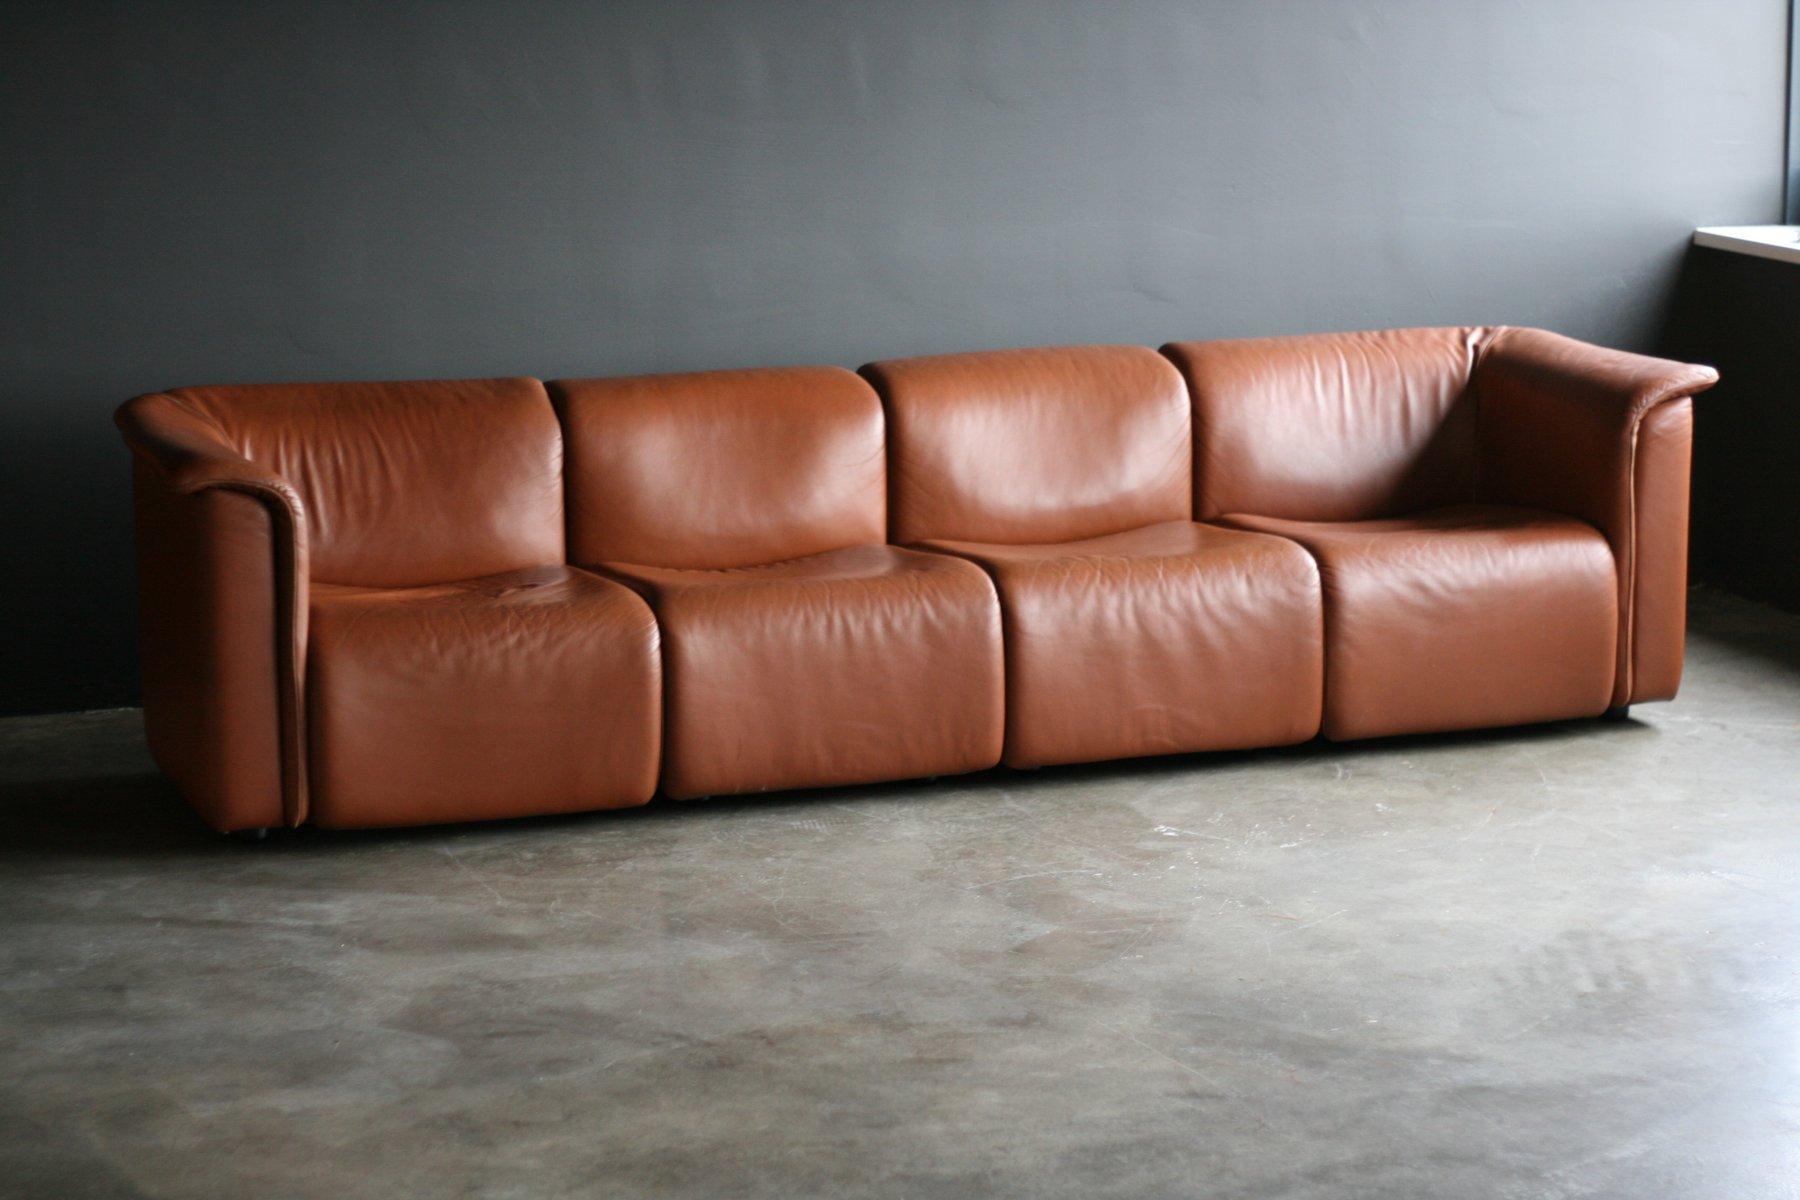 Gro es modulares sofa von wittmann moebelwerkstaetten bei for Sofas rinconeras modulares